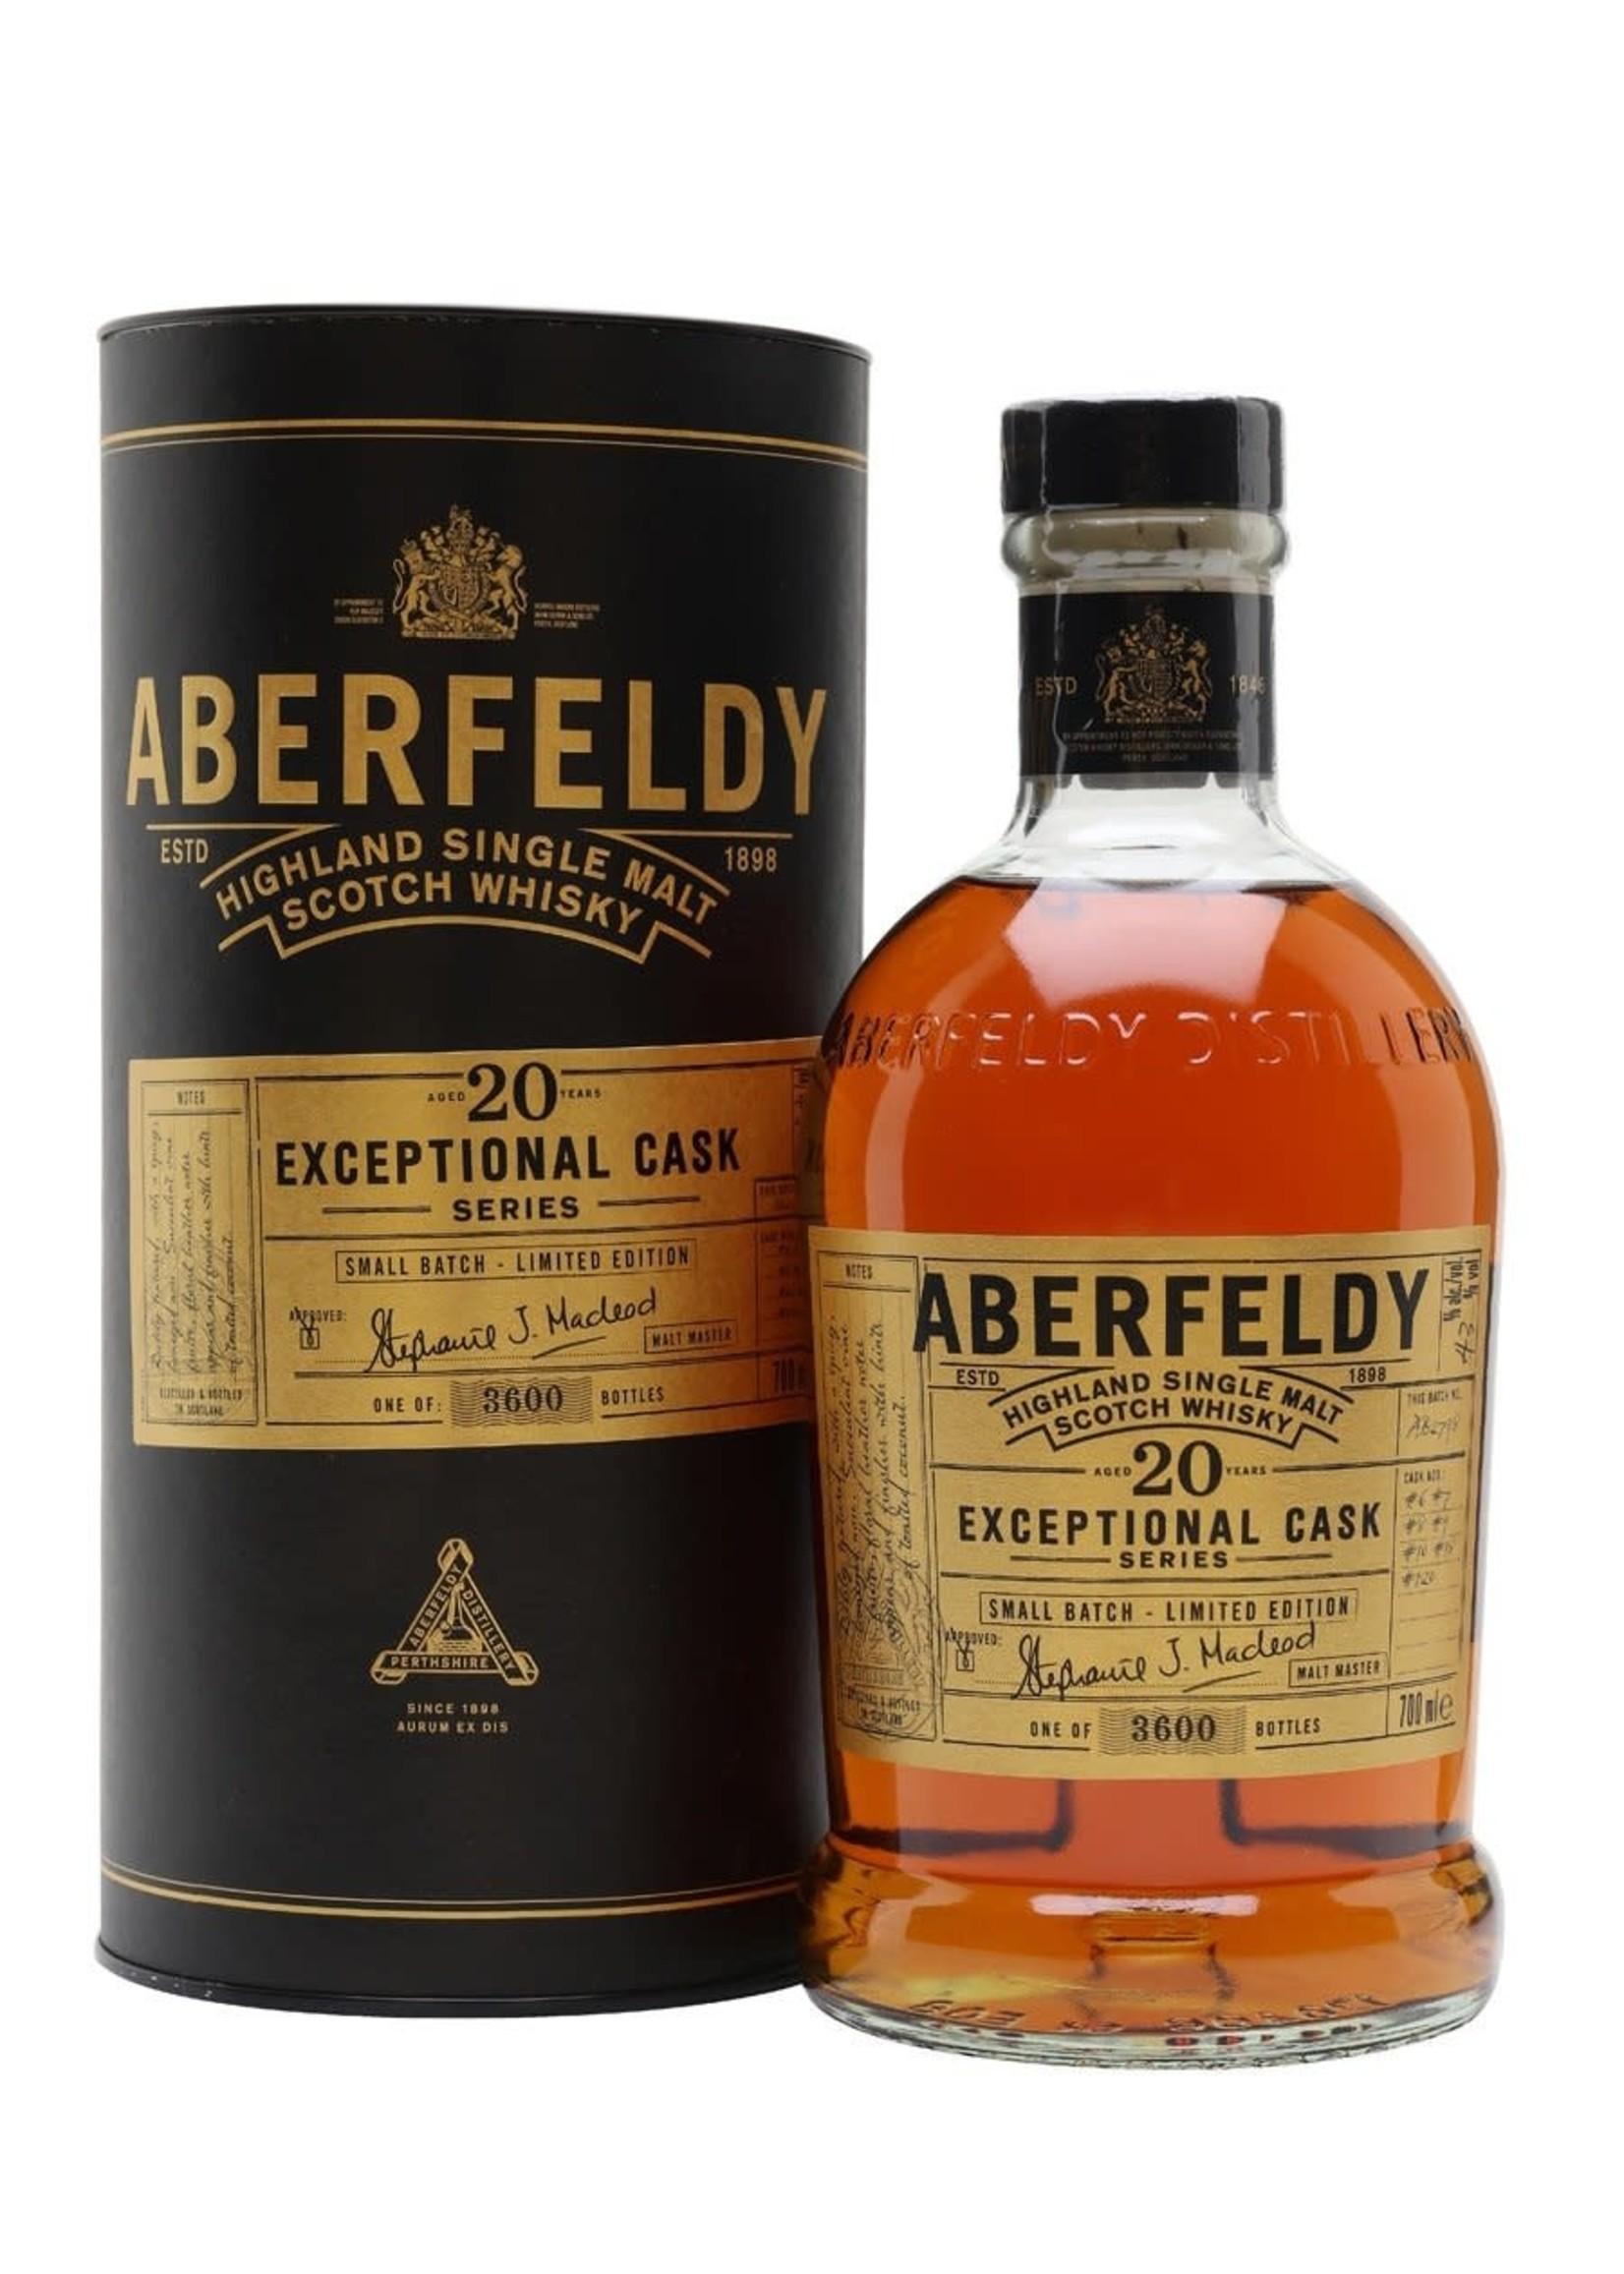 Aberfeldy Aberfeldy / 20 Year Exceptional Cask Series / 750mL